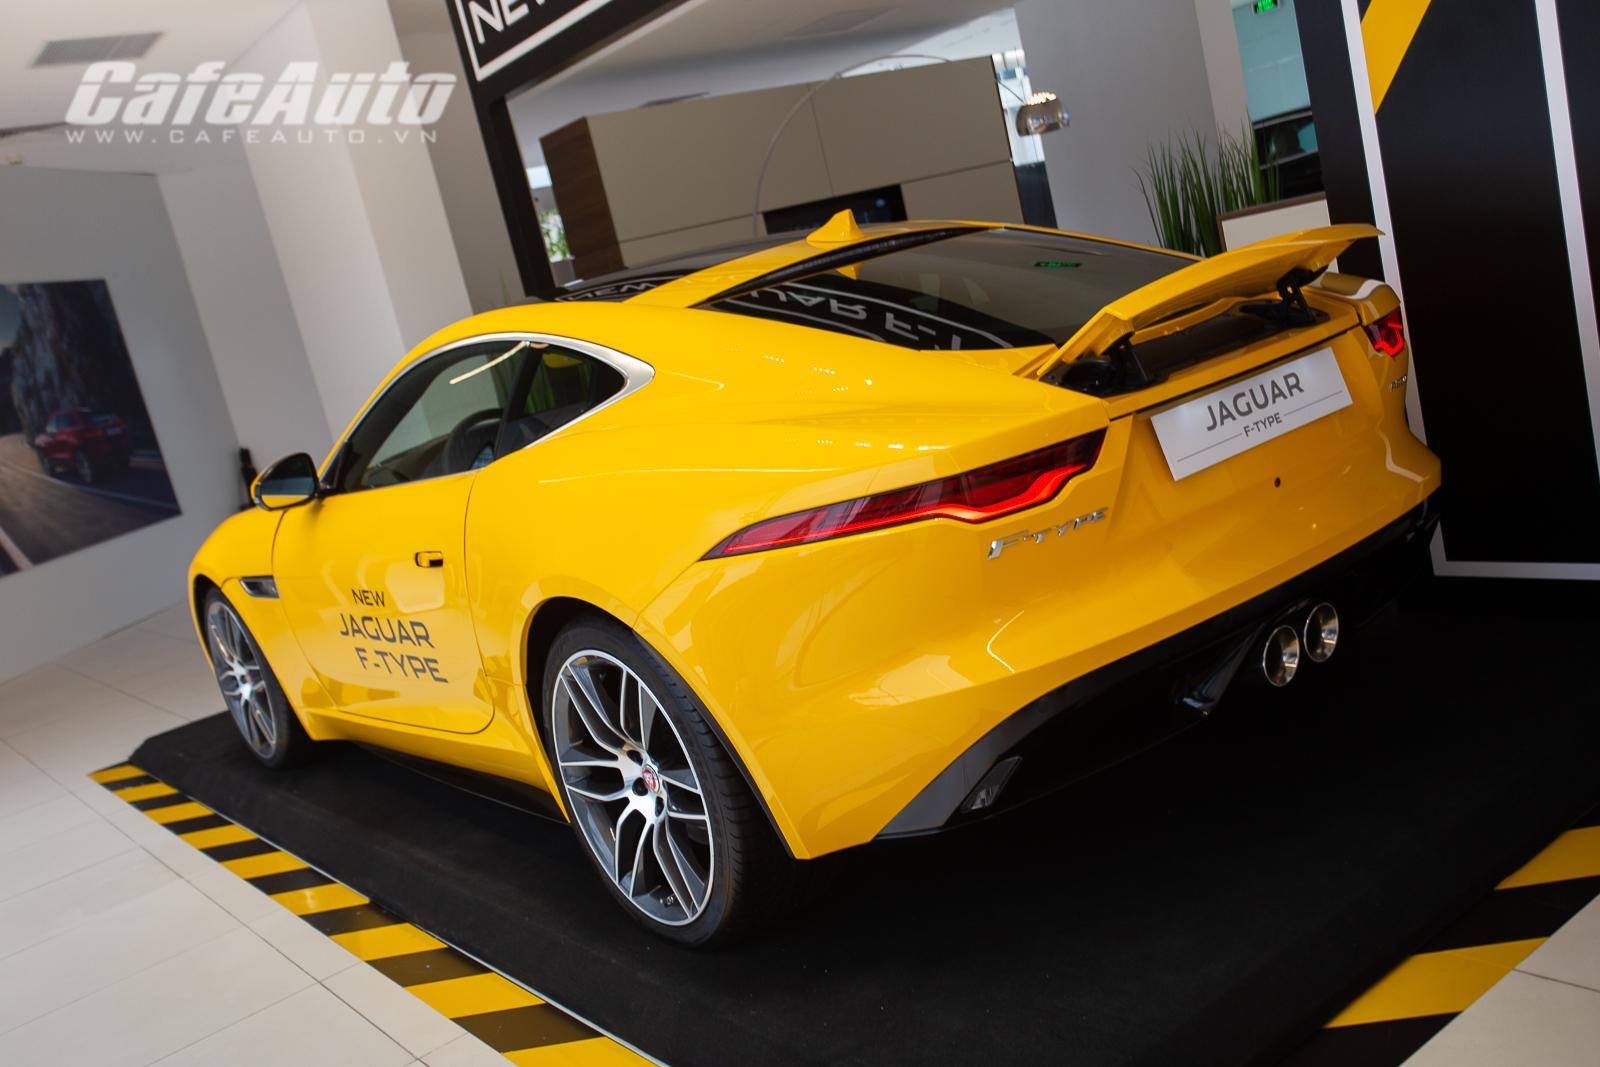 kham-pha-jaguar-f-type-2021-gia-hon-87-ty-xe-the-thao-khong-danh-cho-so-dong